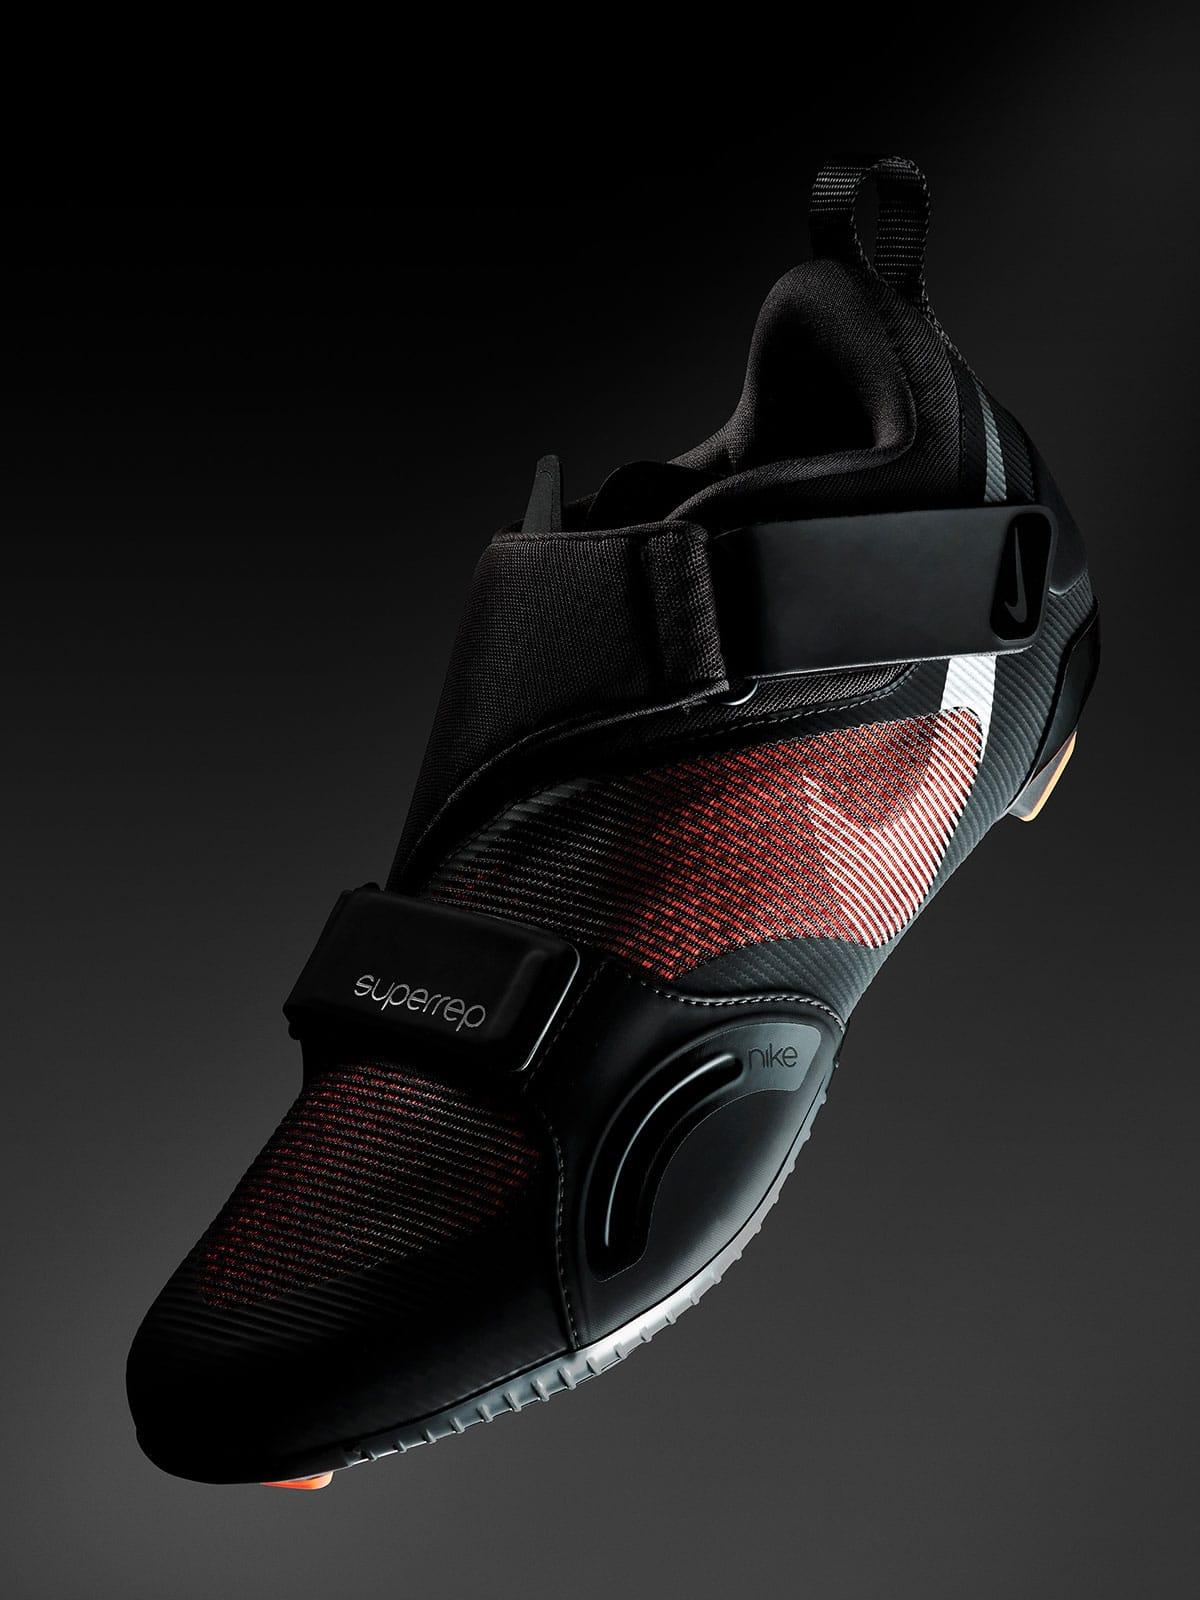 Верх обуви